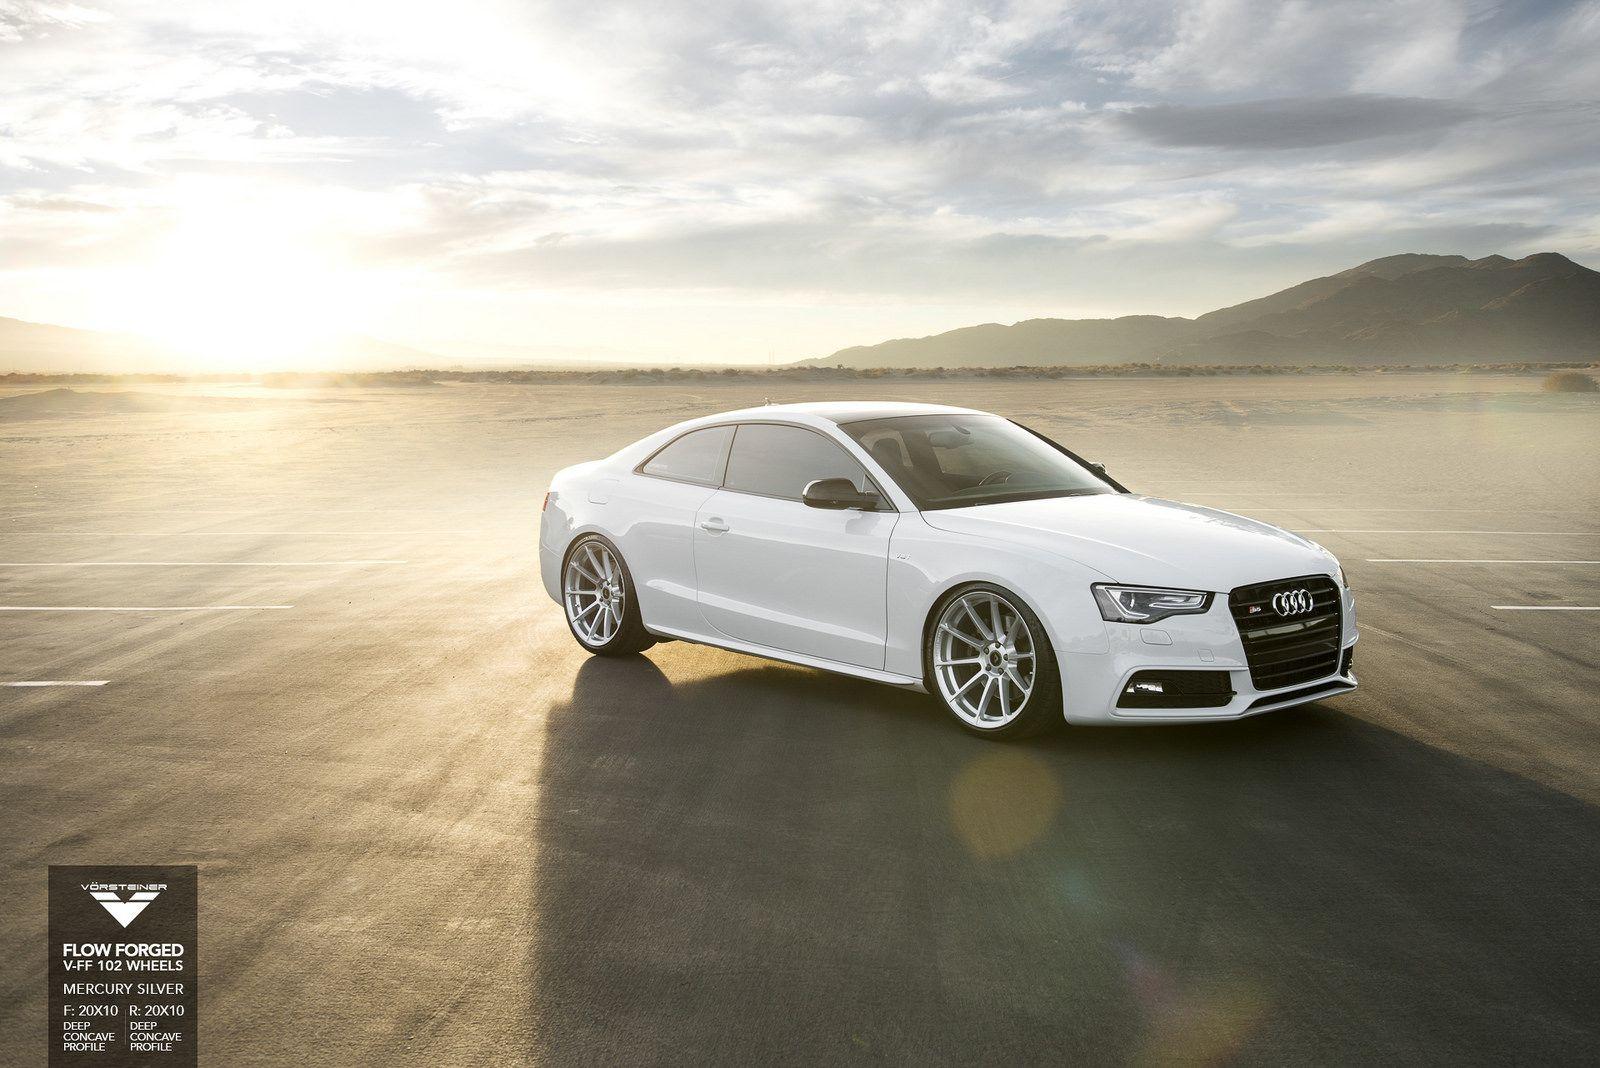 White Audi S5 Poses With Vorsteiner V Ff 102 Wheels Gtspirit 2015 vorsteiner audi s5 v ff 3